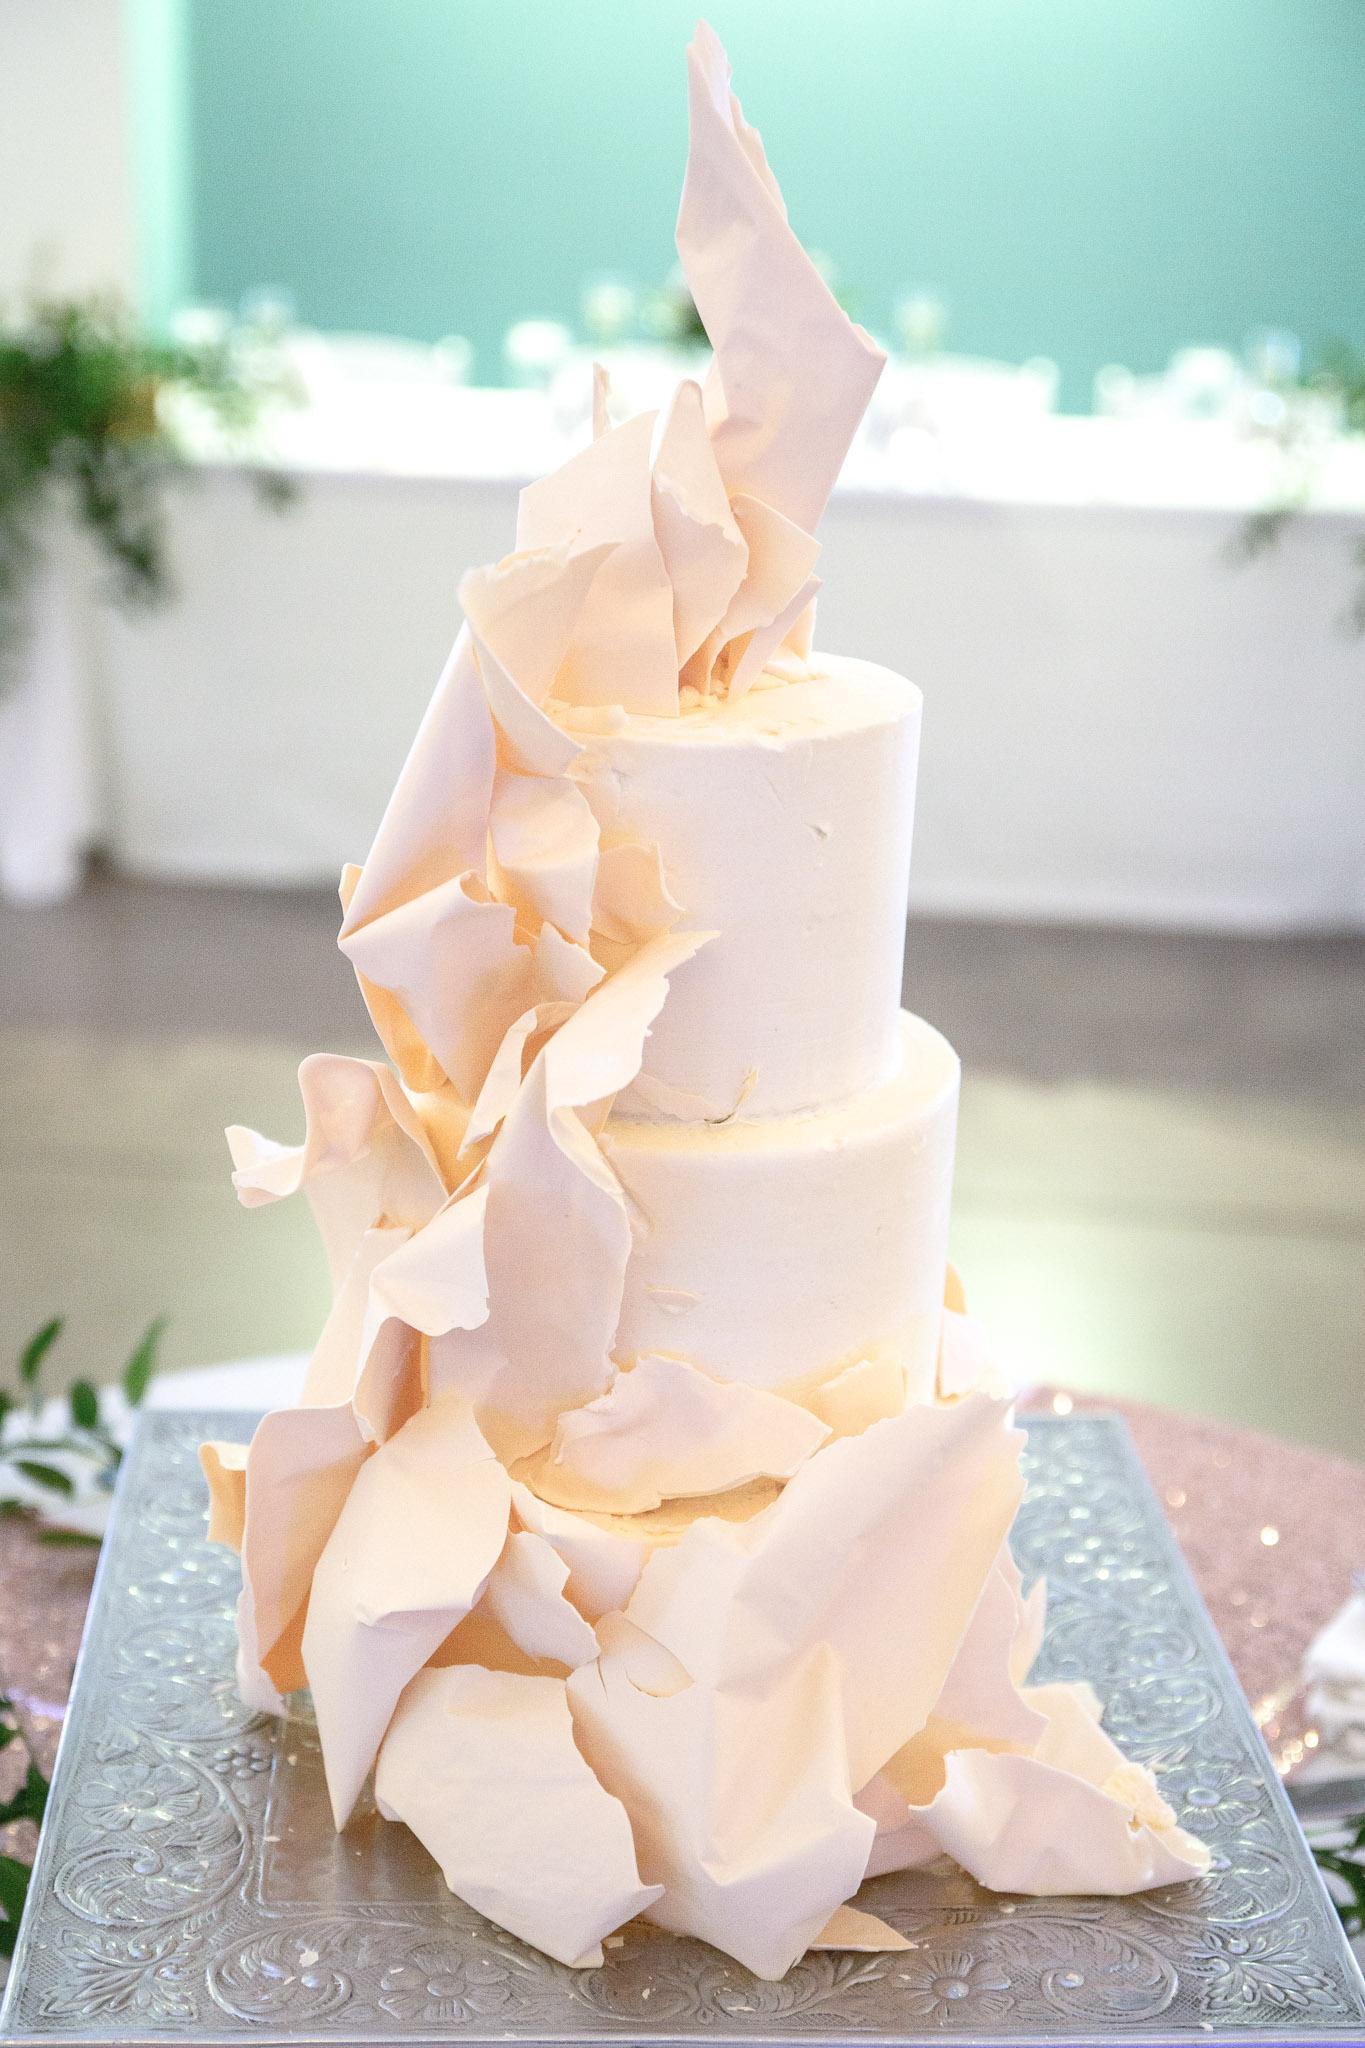 foundary art centre wedding photography (4 of 37).JPG